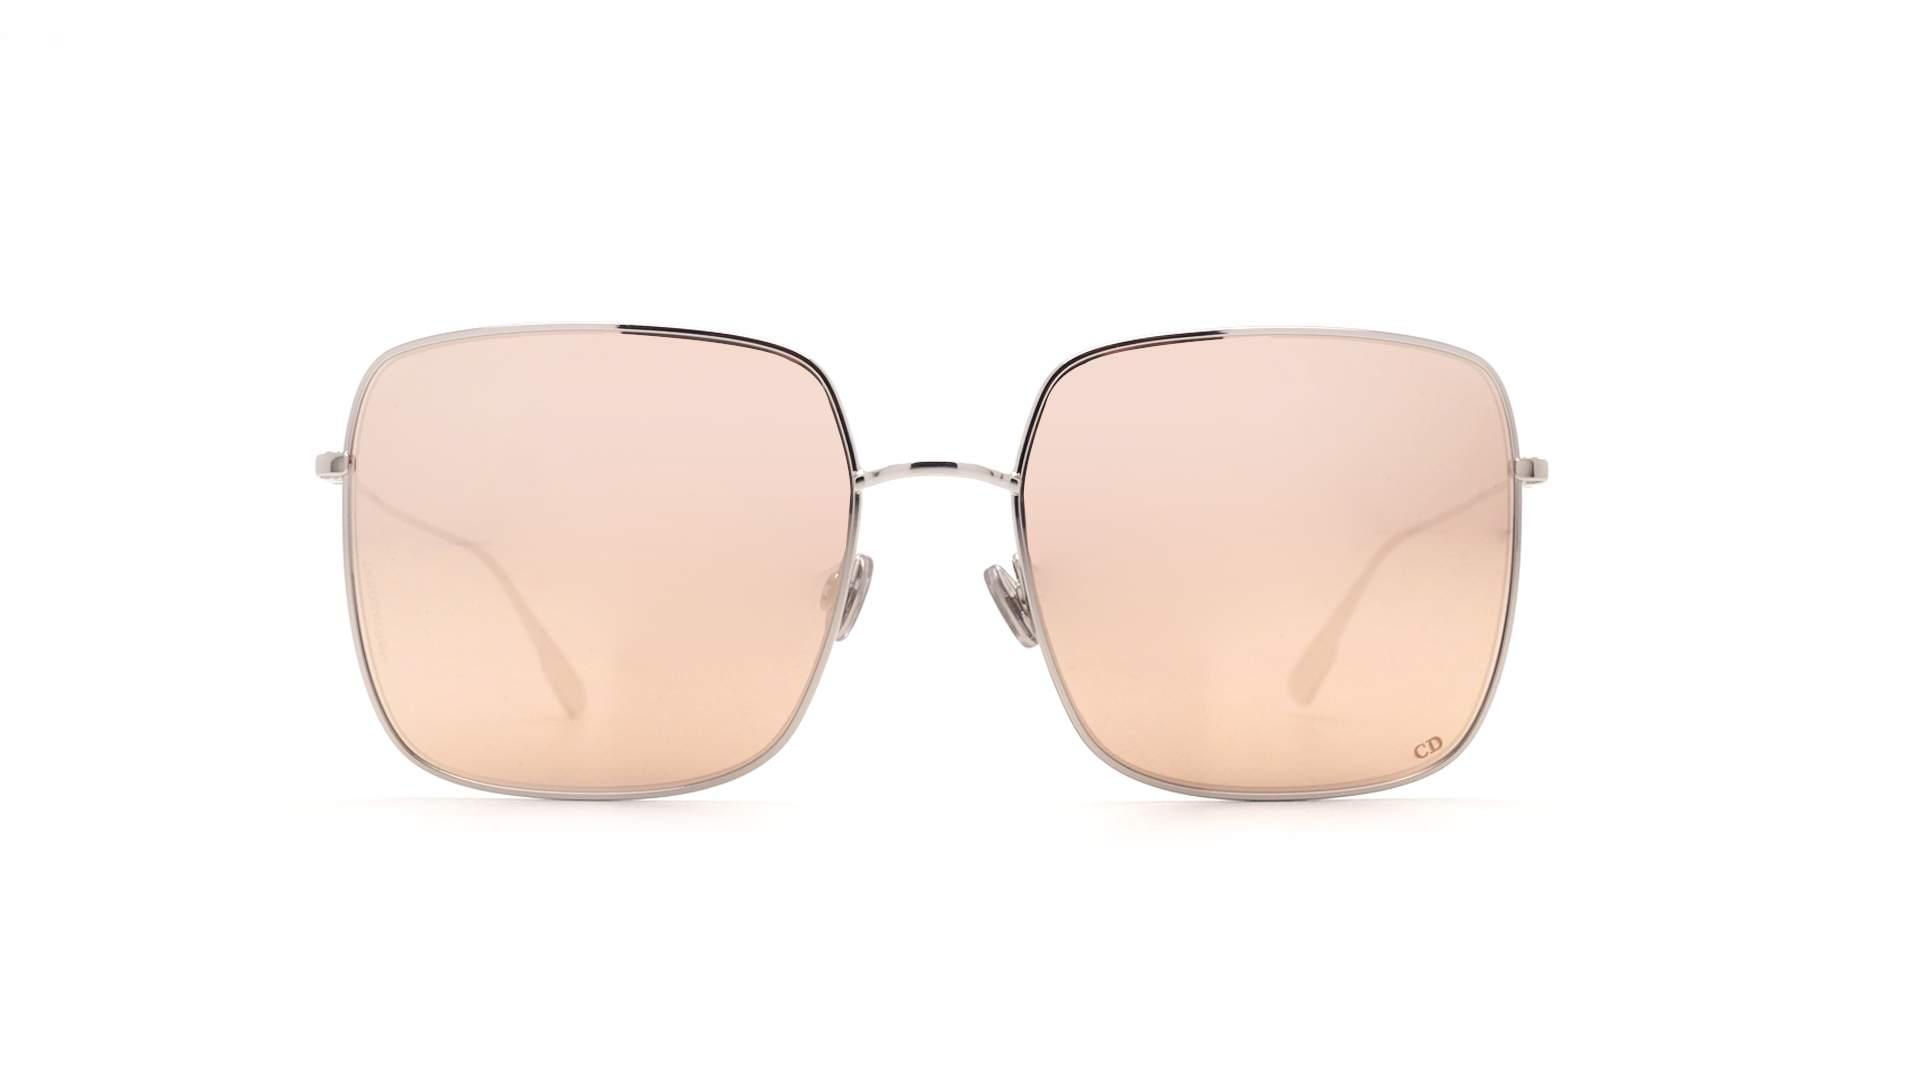 b0a76935d77c9 Sunglasses Dior Stellaire 1 Silver DIORSTELLAIRE1 010SQ 59-18 Large Mirror